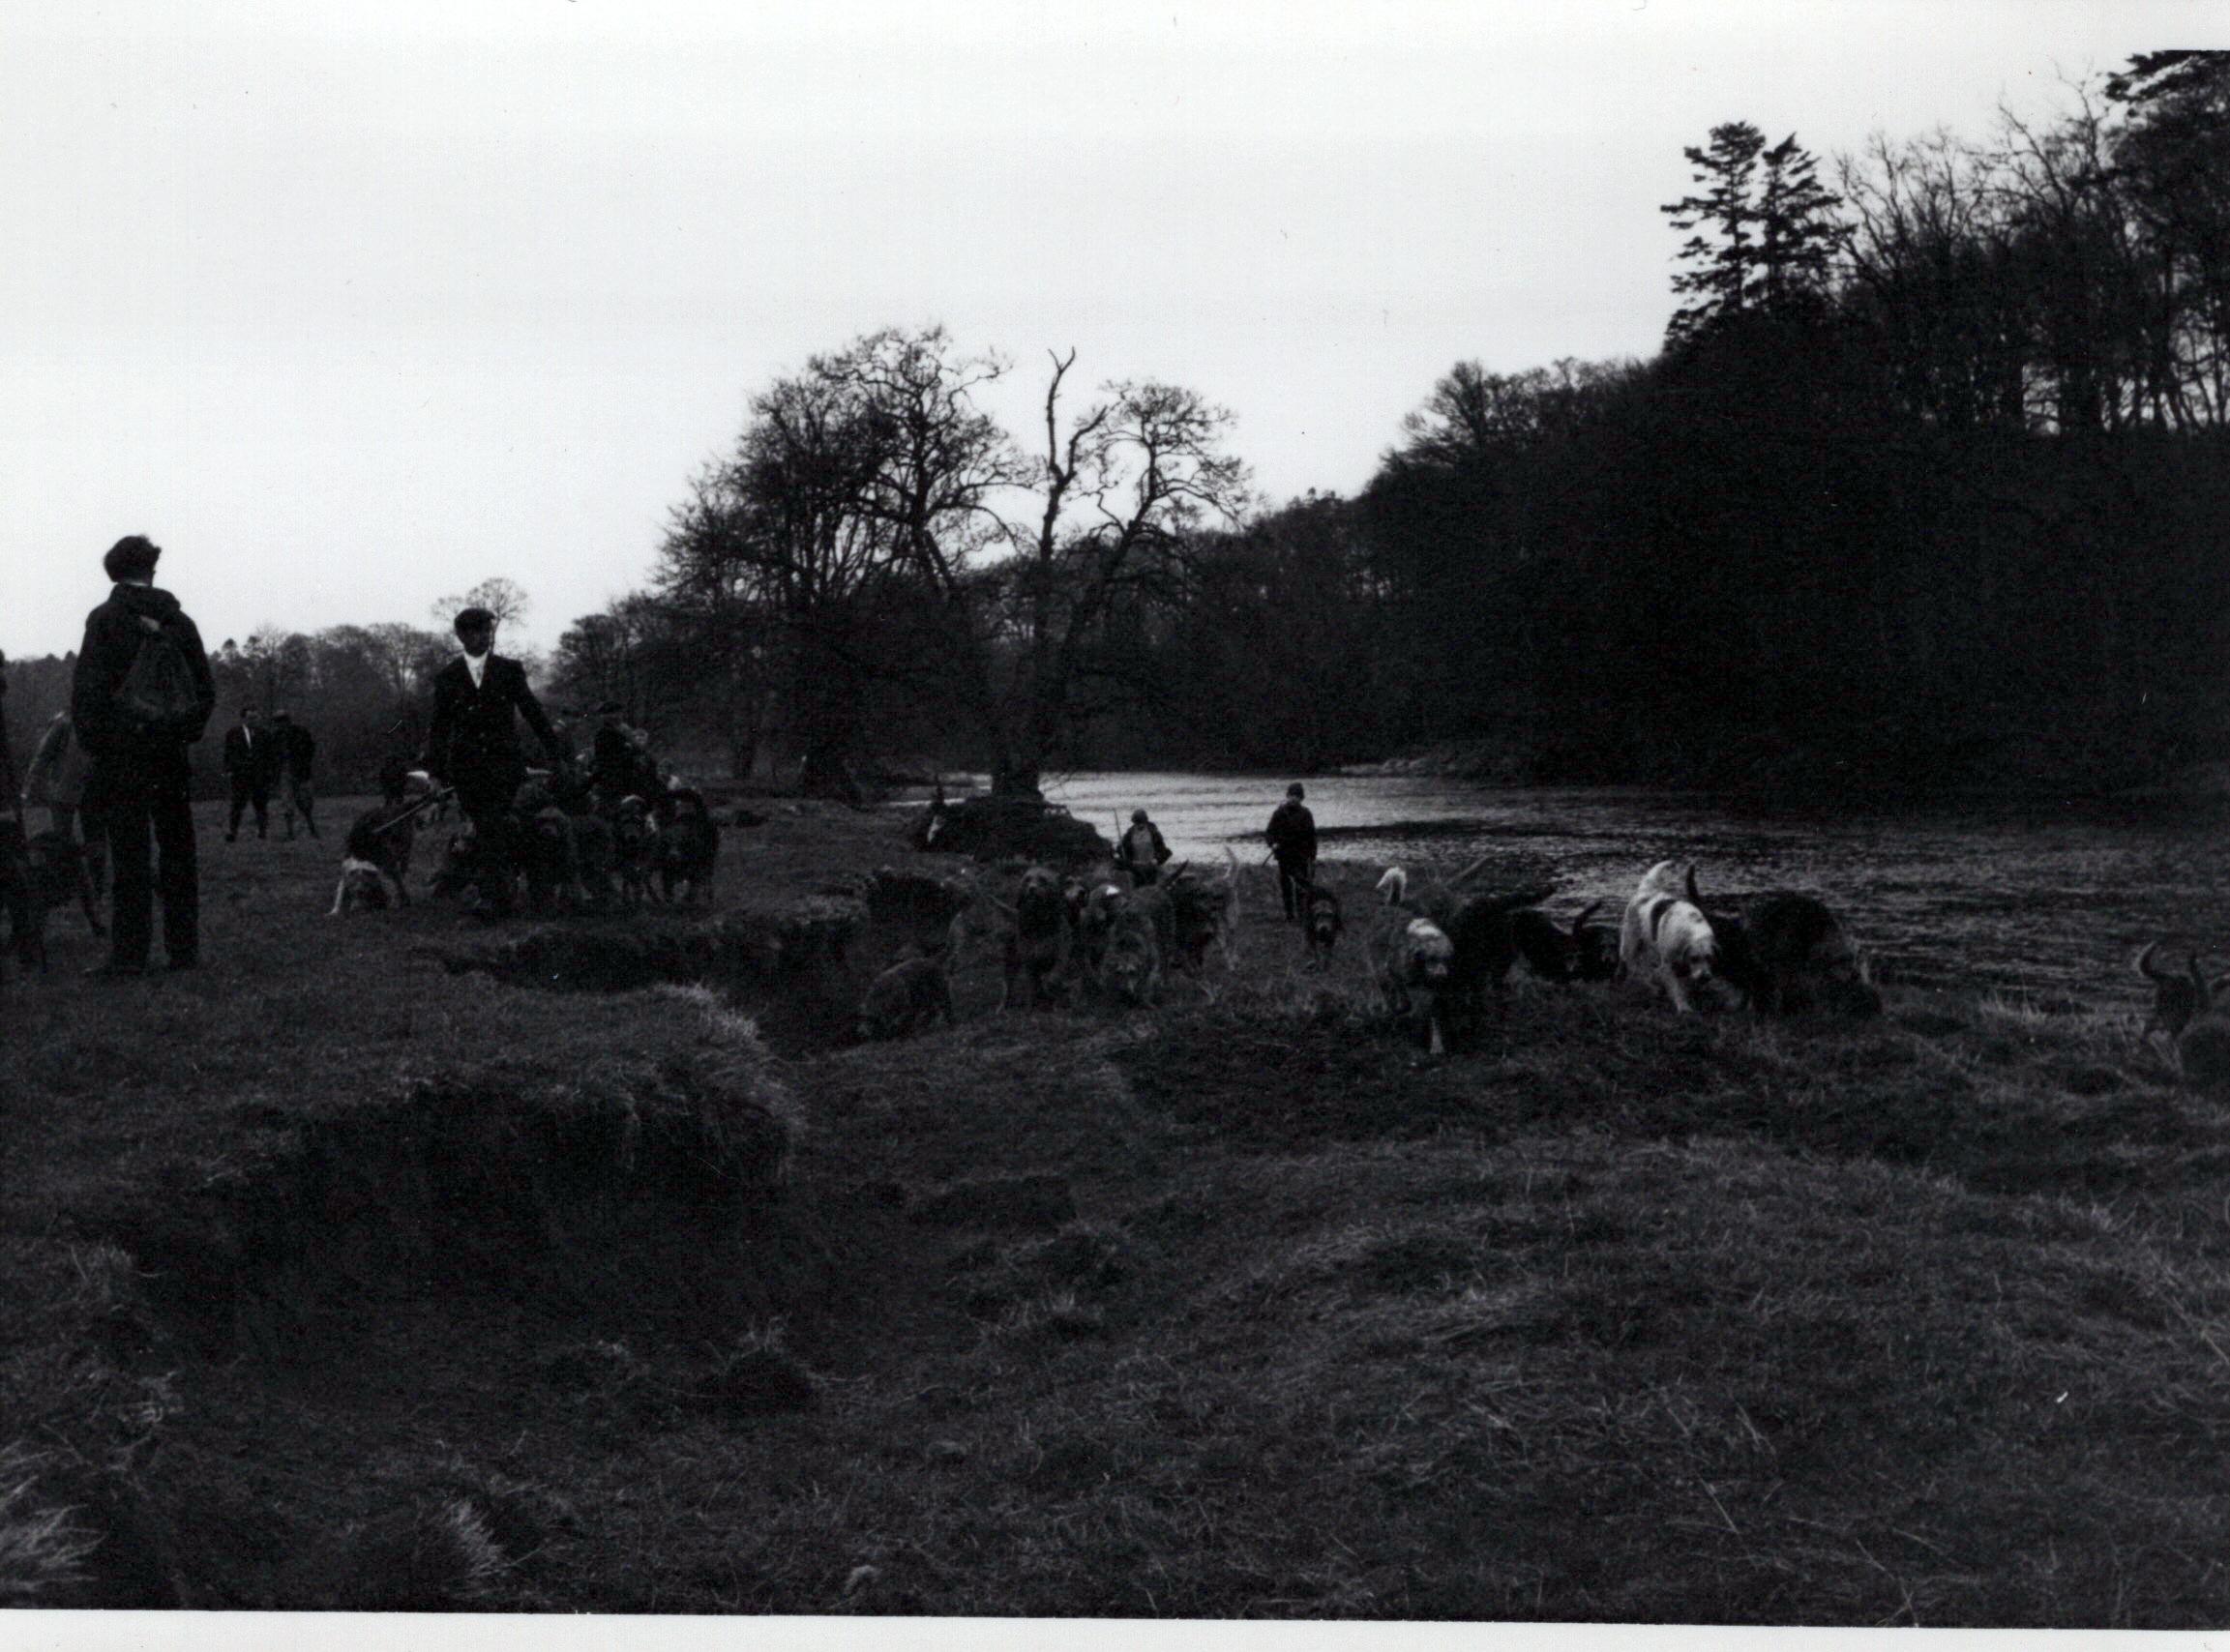 1970_Mei_Otterhound-Schotland_0024_a